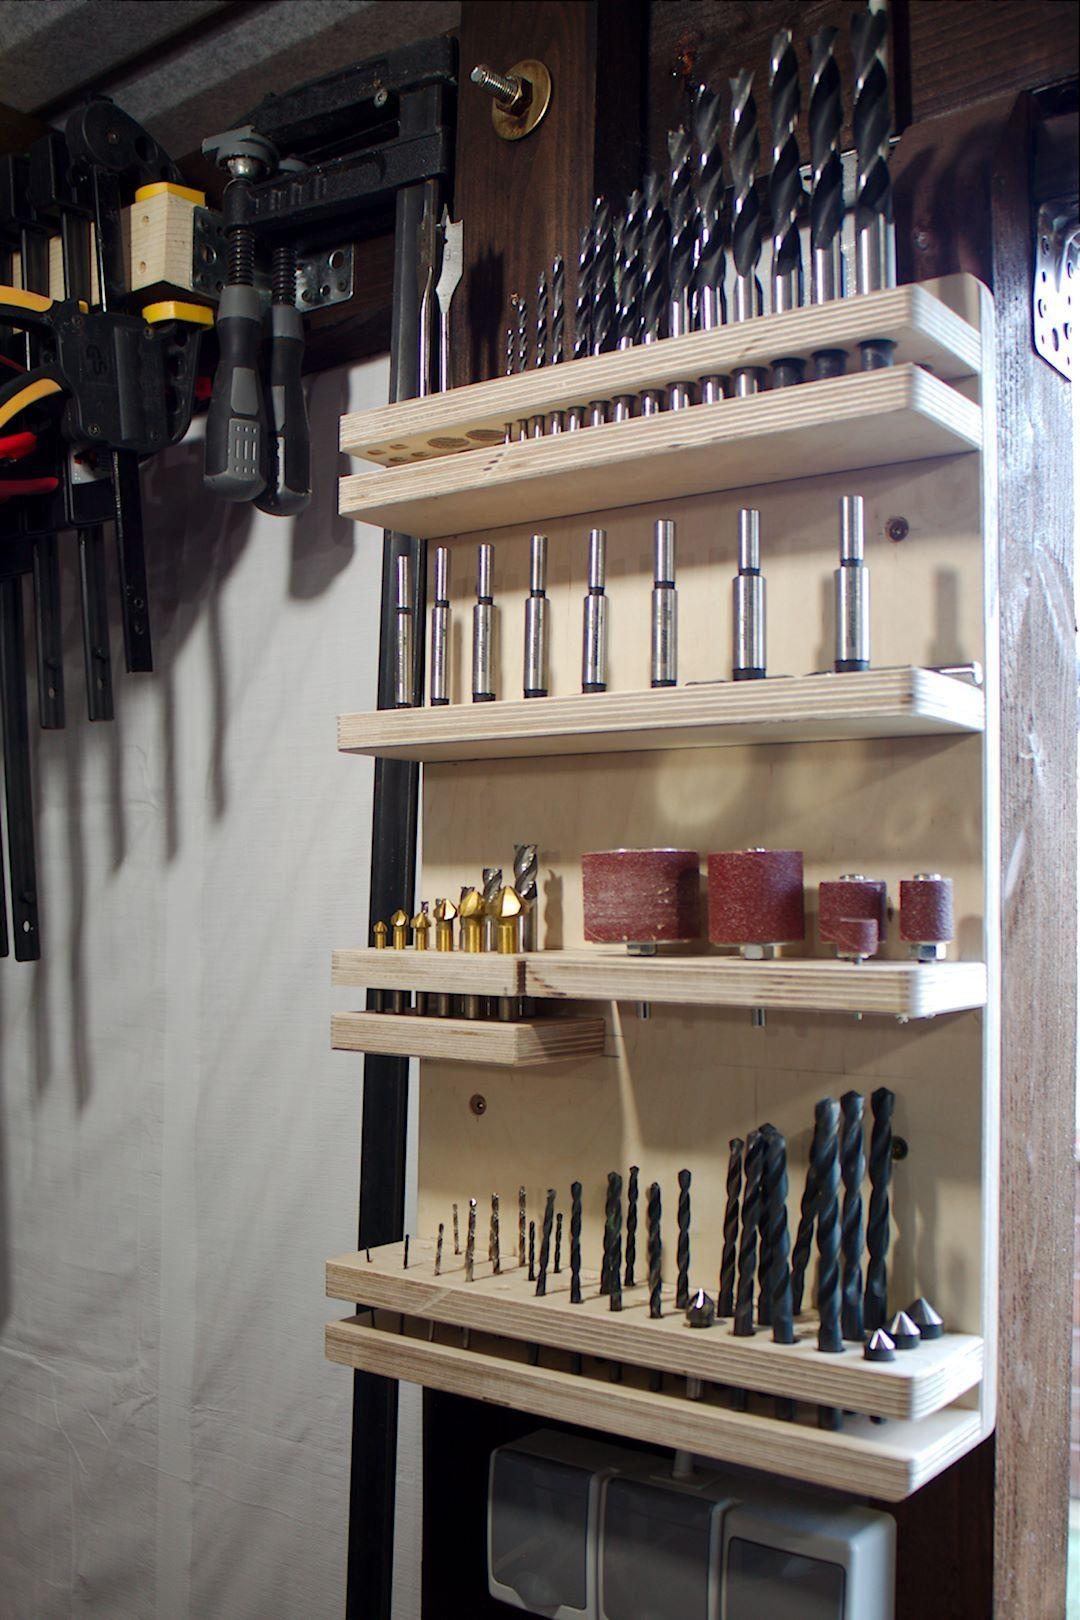 aufbewahrungsregal f r bohrmaschinenzubeh r bauanleitung zum woodworking pinterest. Black Bedroom Furniture Sets. Home Design Ideas